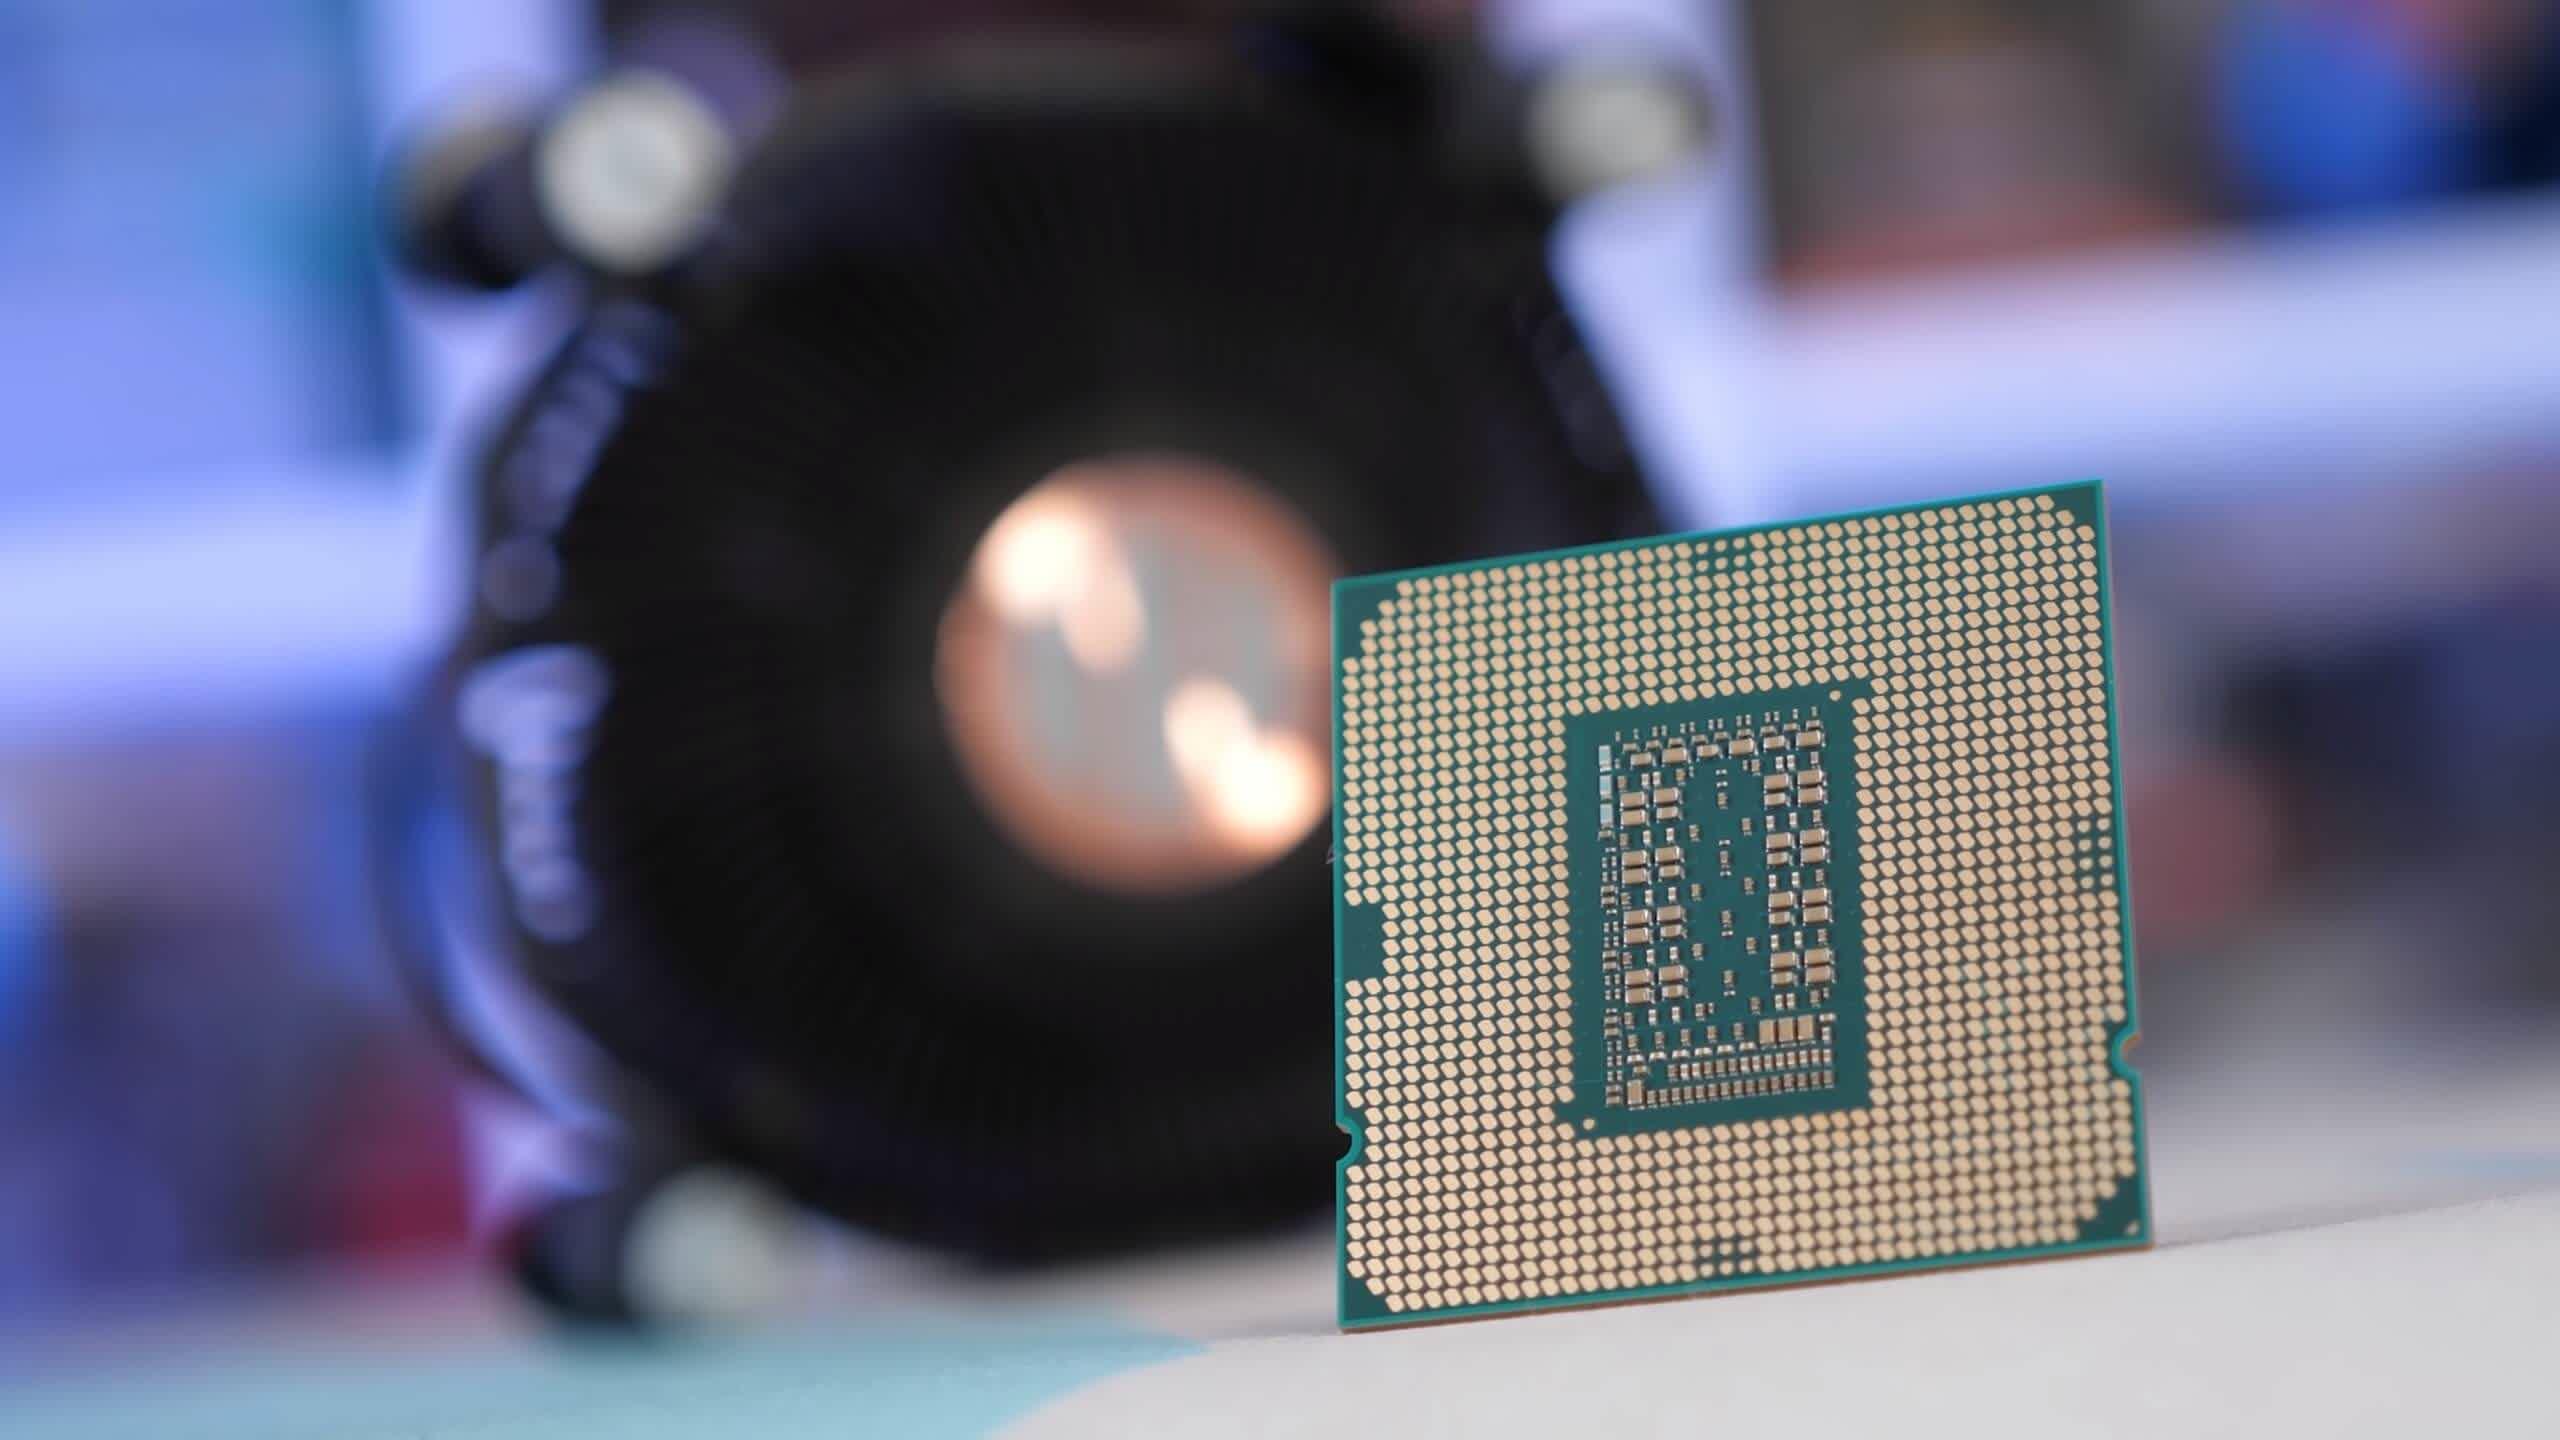 1630151653 892 Fabriquer un processeur de jeu rapide a quatre coeurs